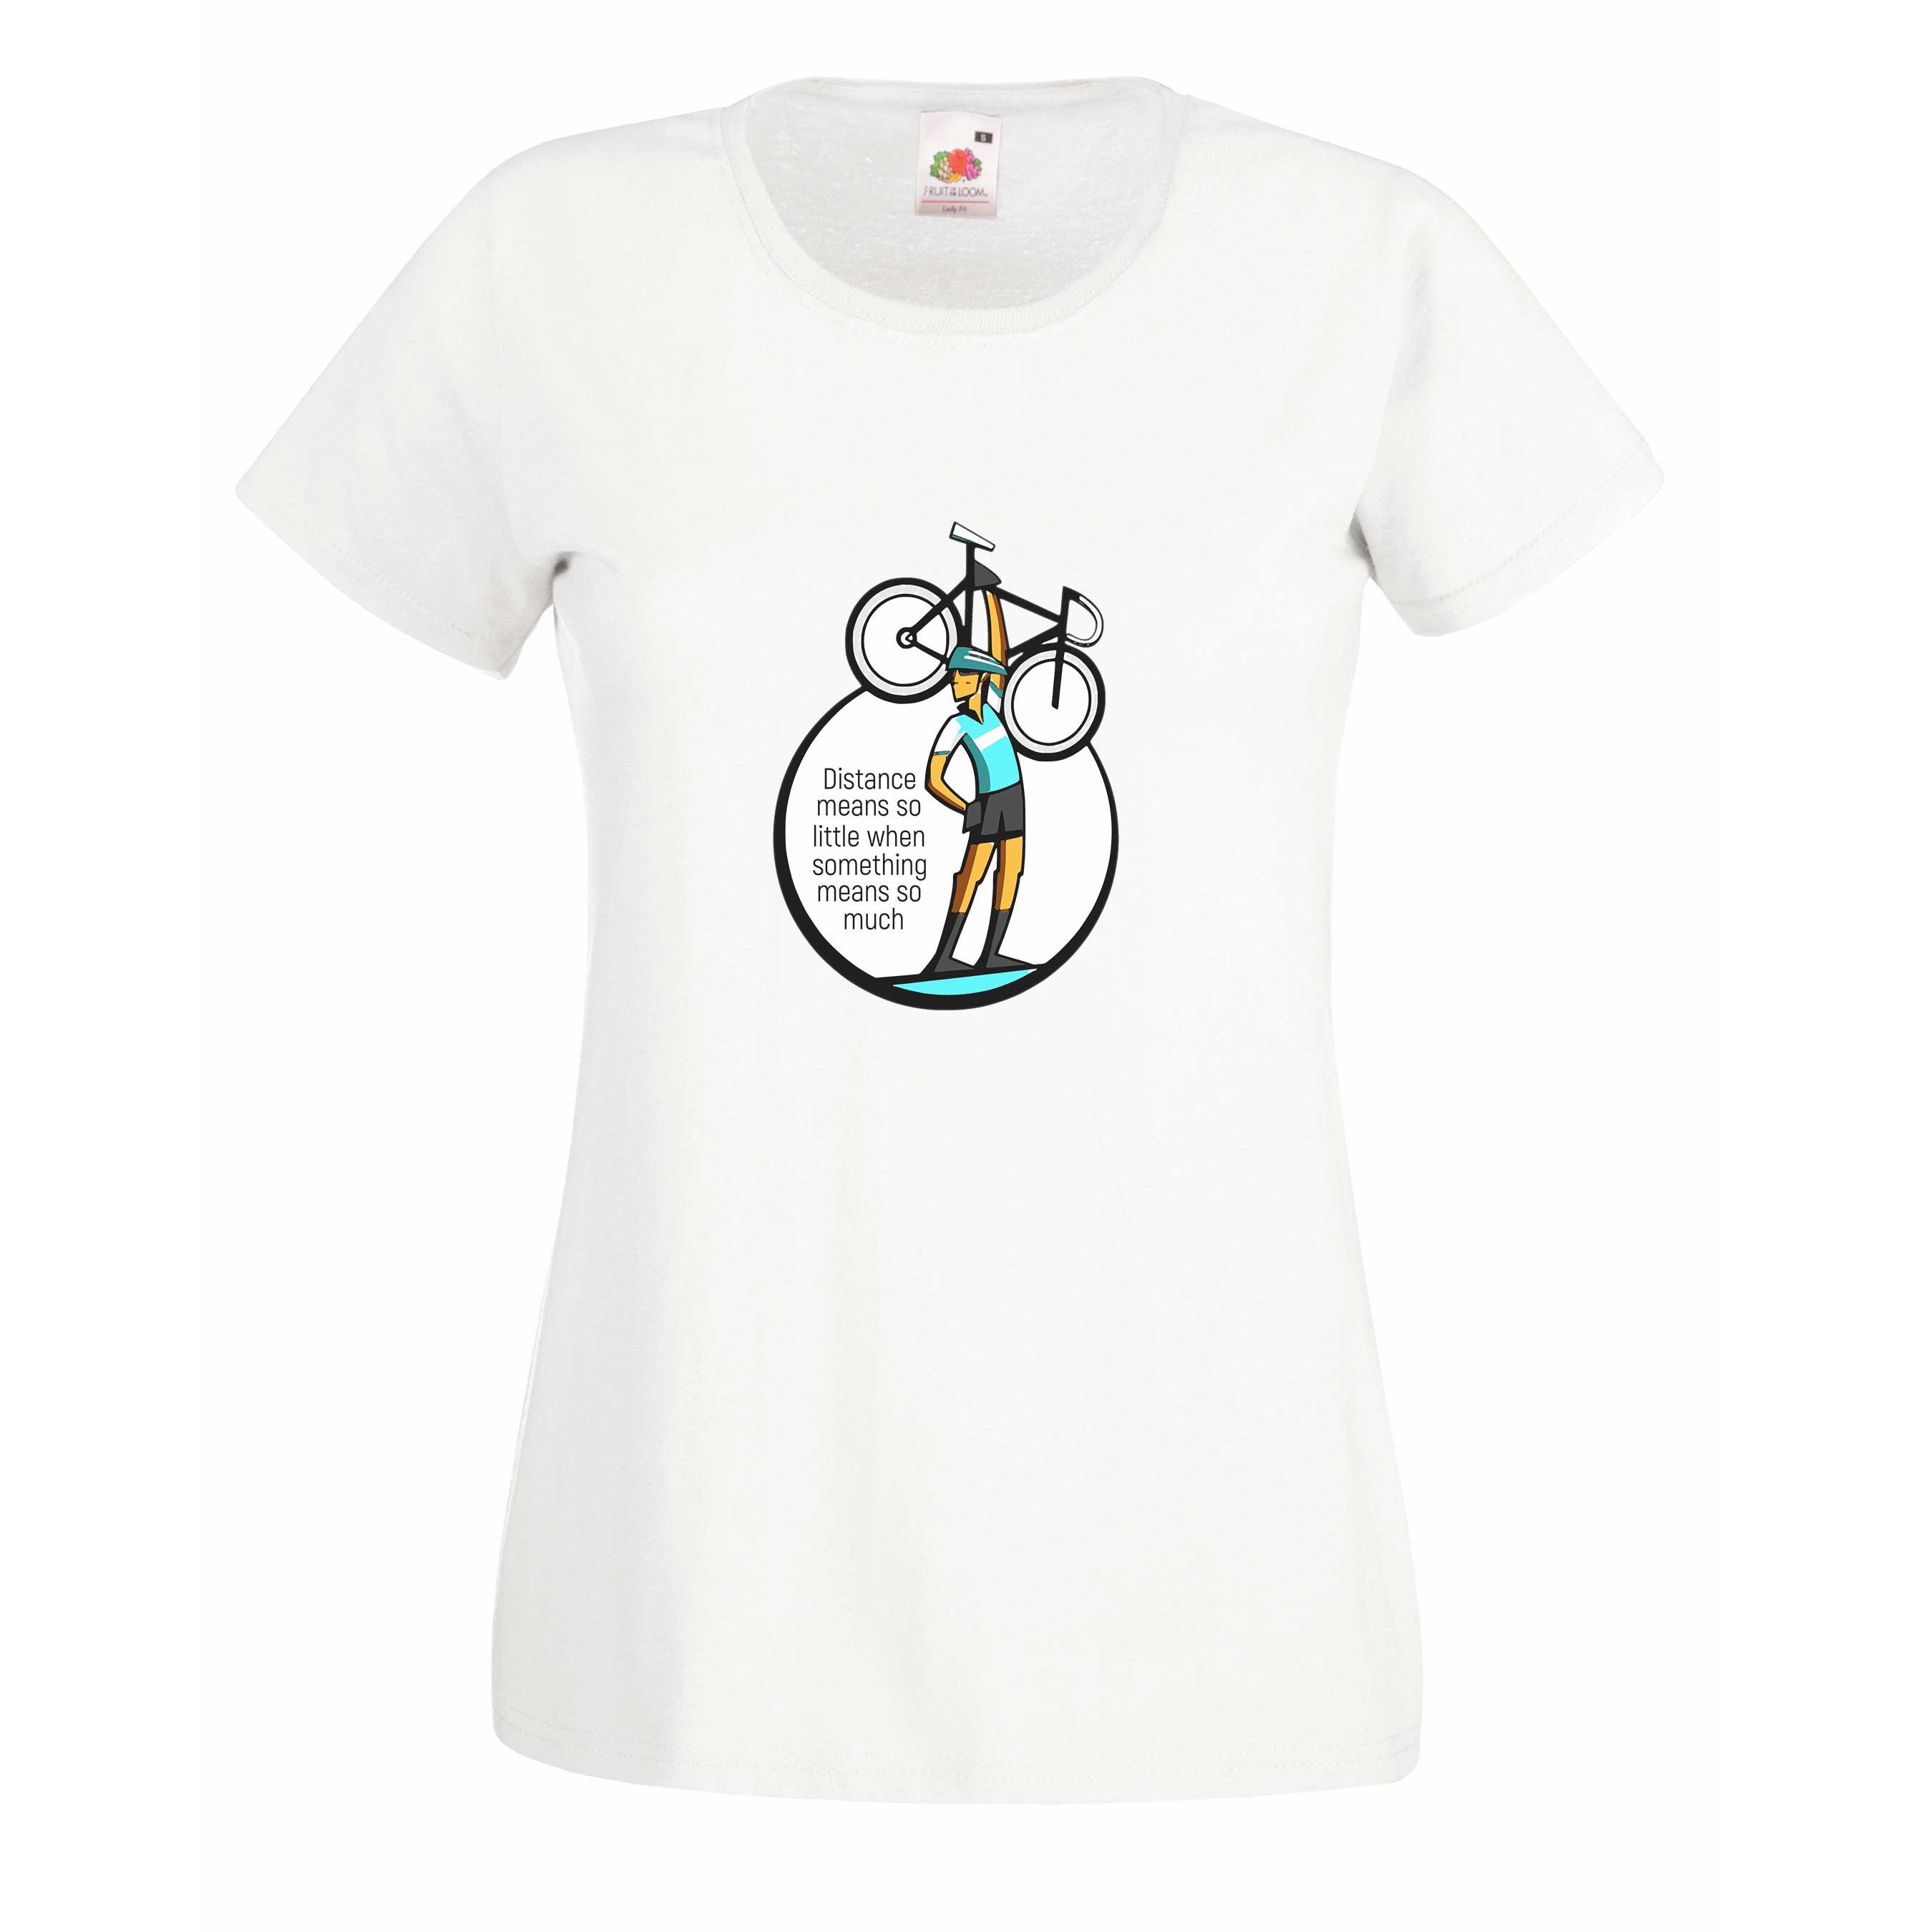 Distance design for t-shirt, hoodie & sweatshirt